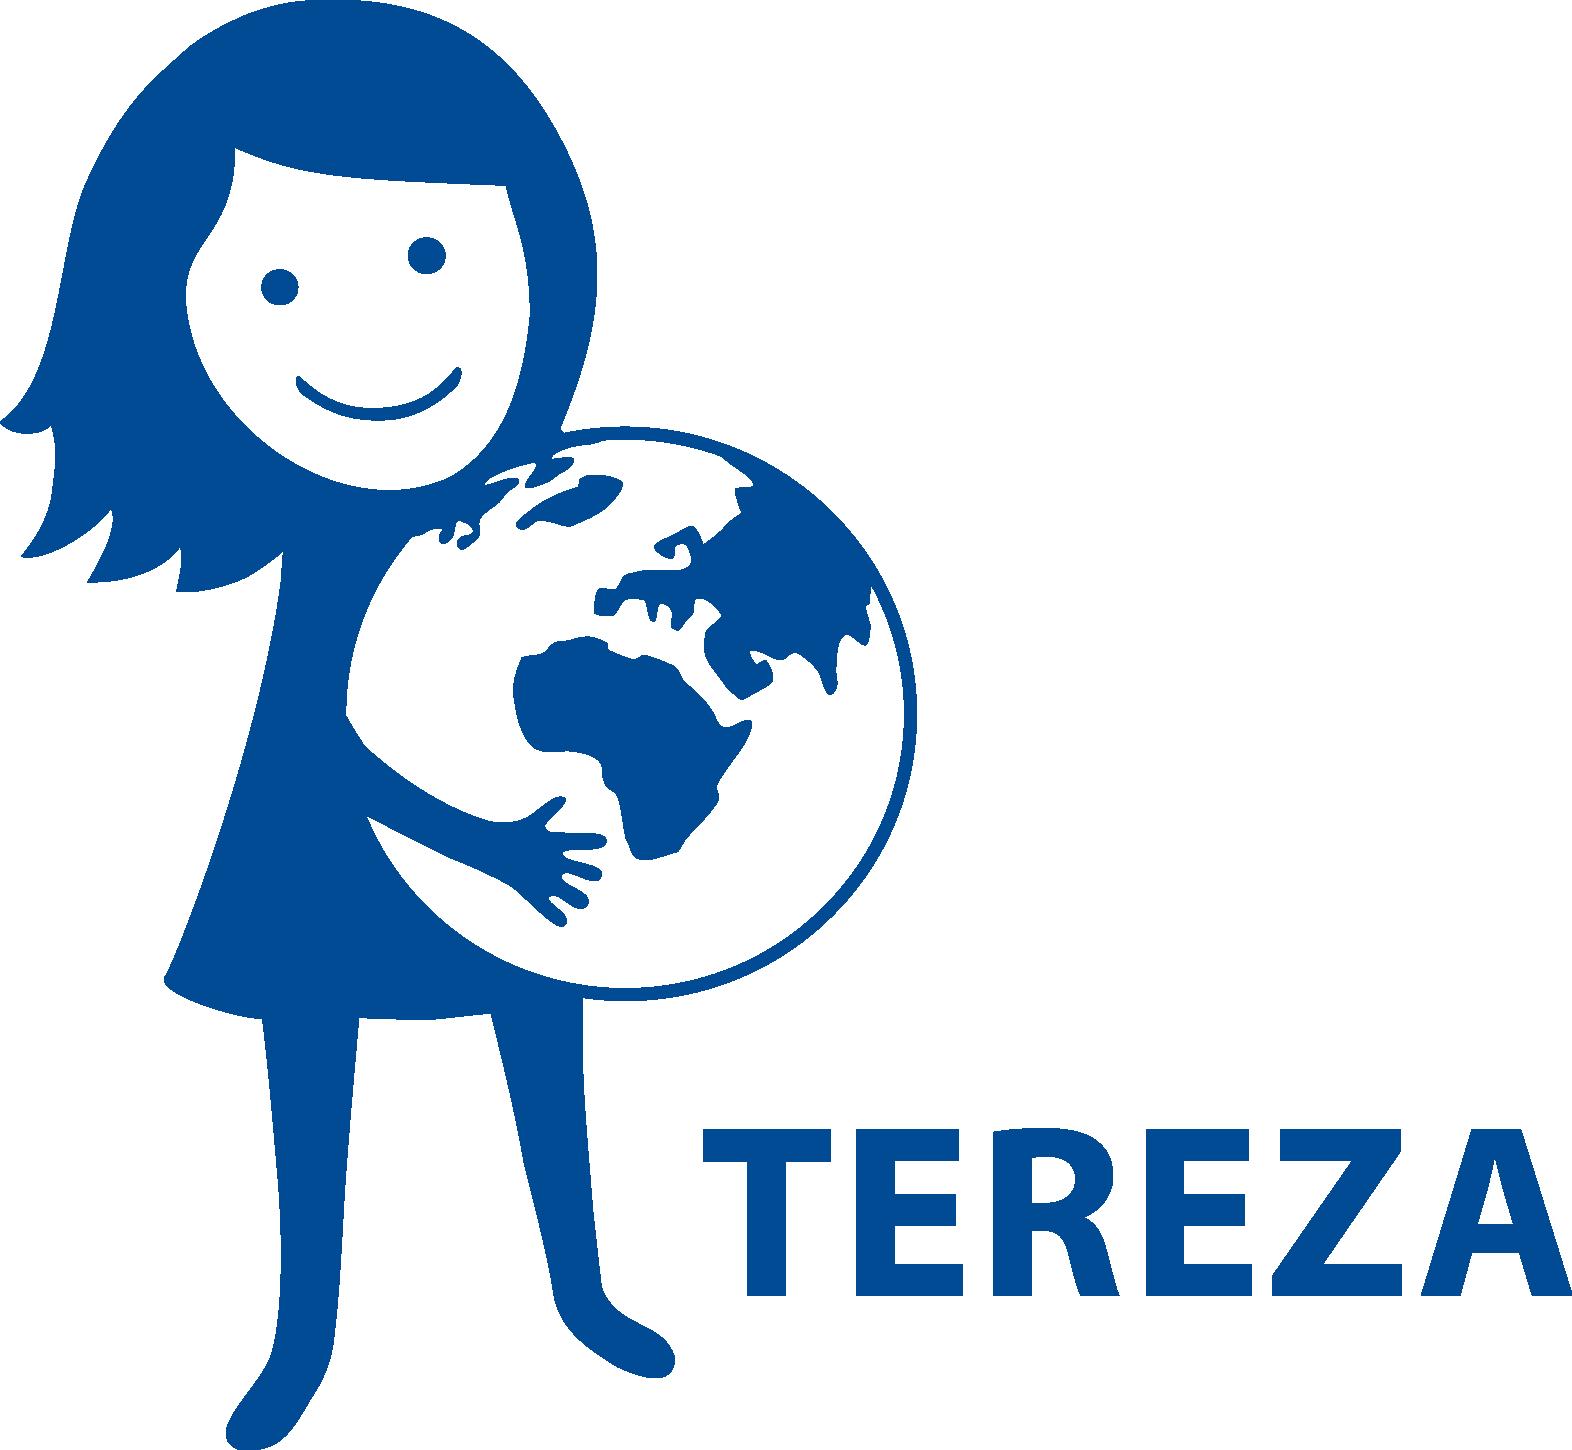 logo_TEREZA (1).png